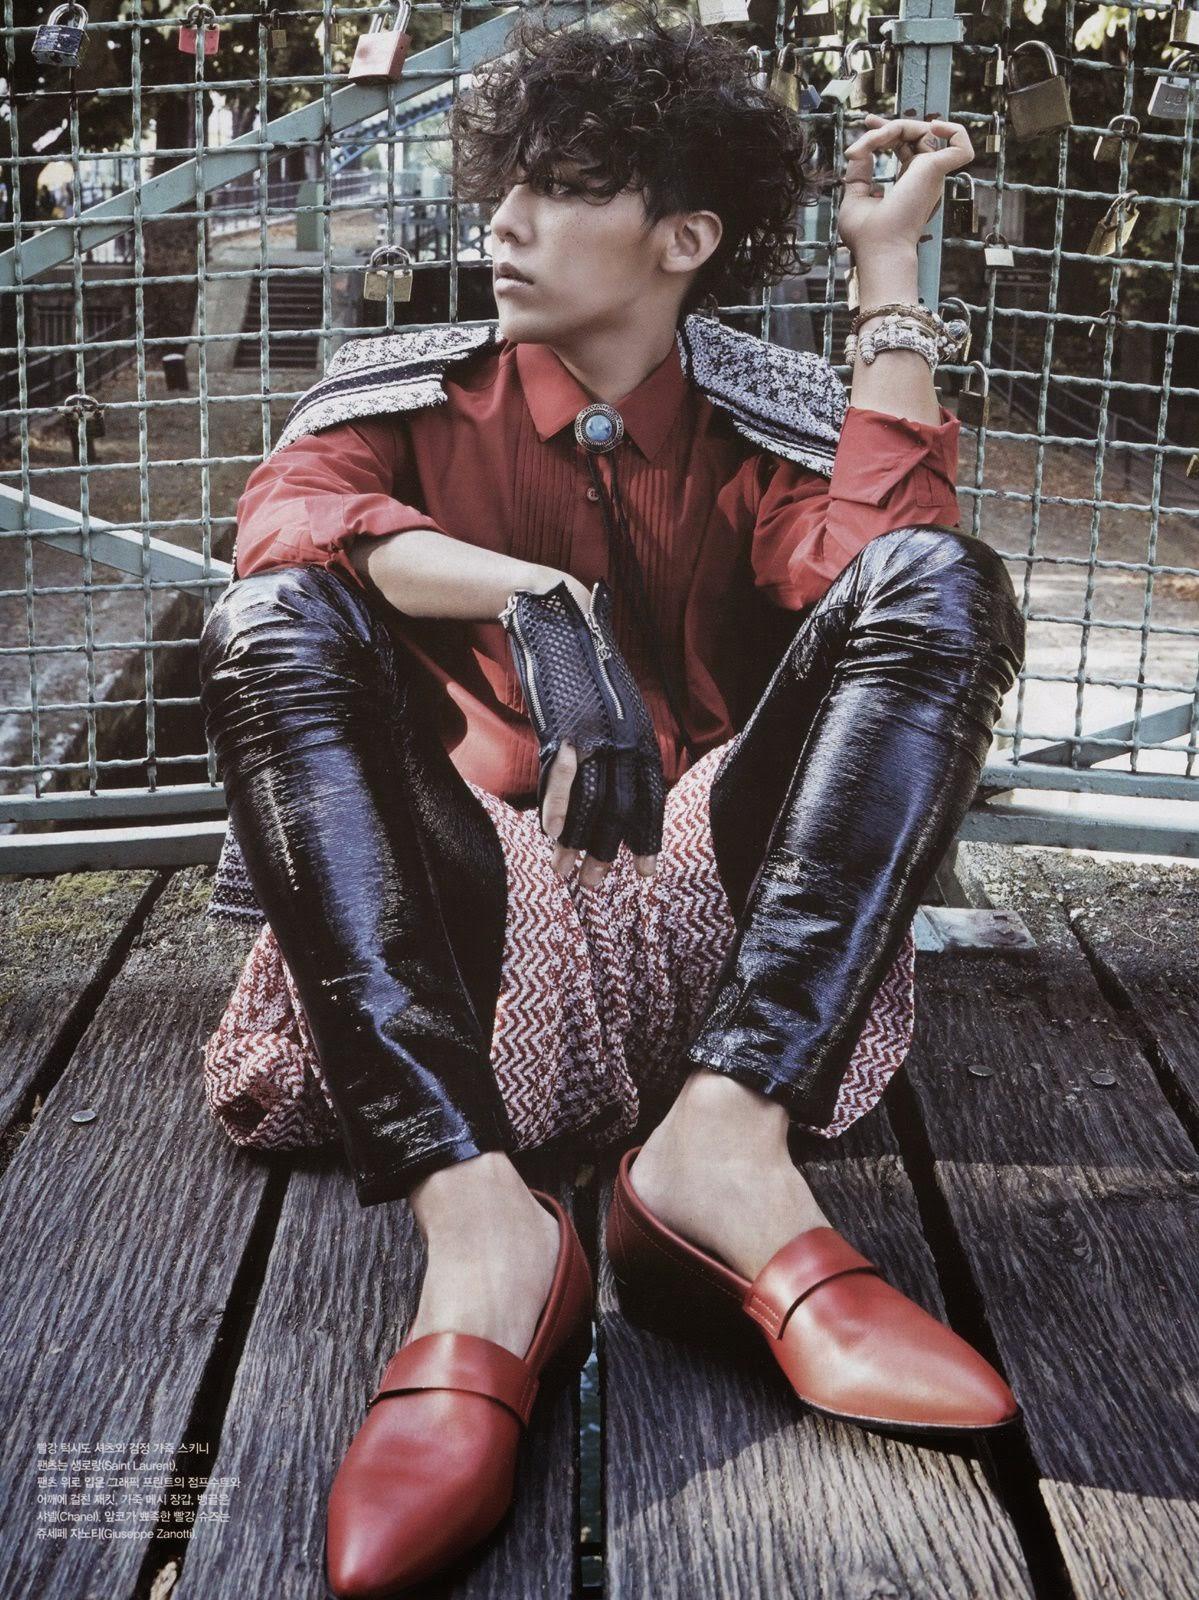 Scans: G-Dragon for Vogue Korea (January 2015) [PHOTOS]  Scans: G-Dragon for Vogue Korea (January 2015) [PHOTOS]  Scans: G-Dragon for Vogue Korea (January 2015) [PHOTOS]